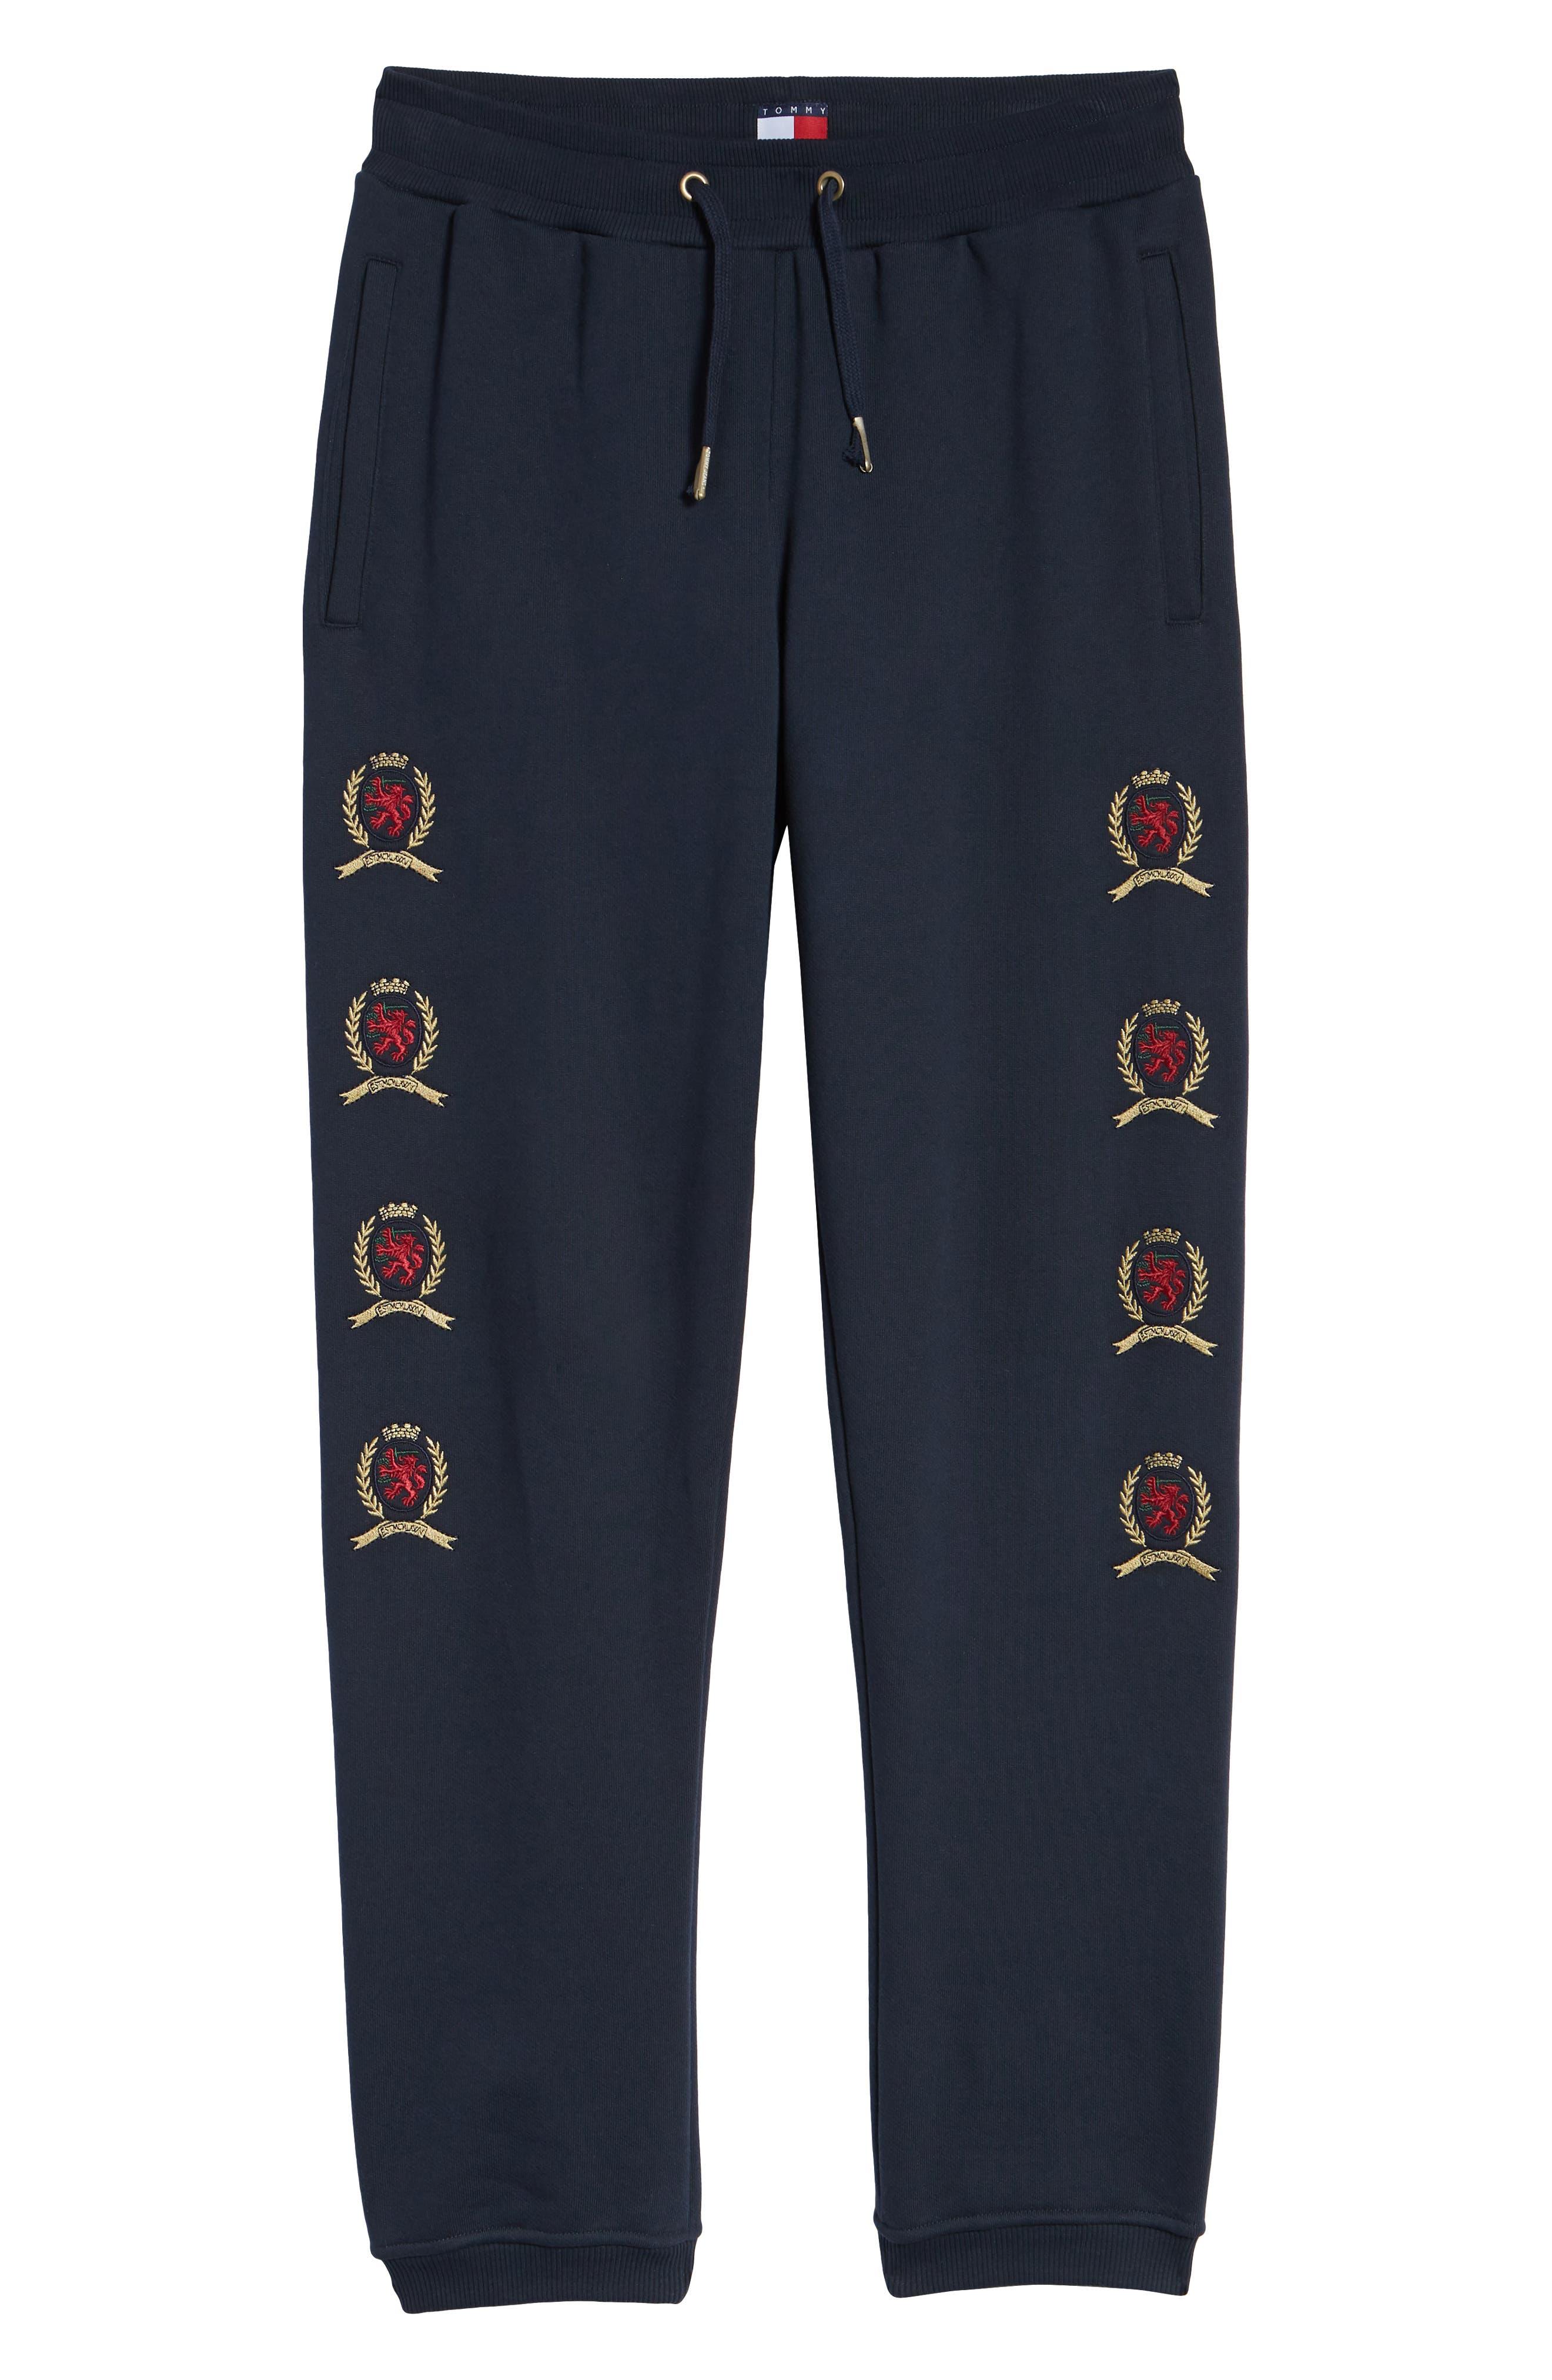 Embroidered Crest Sweatpants,                             Alternate thumbnail 6, color,                             DARK SAPPHIRE